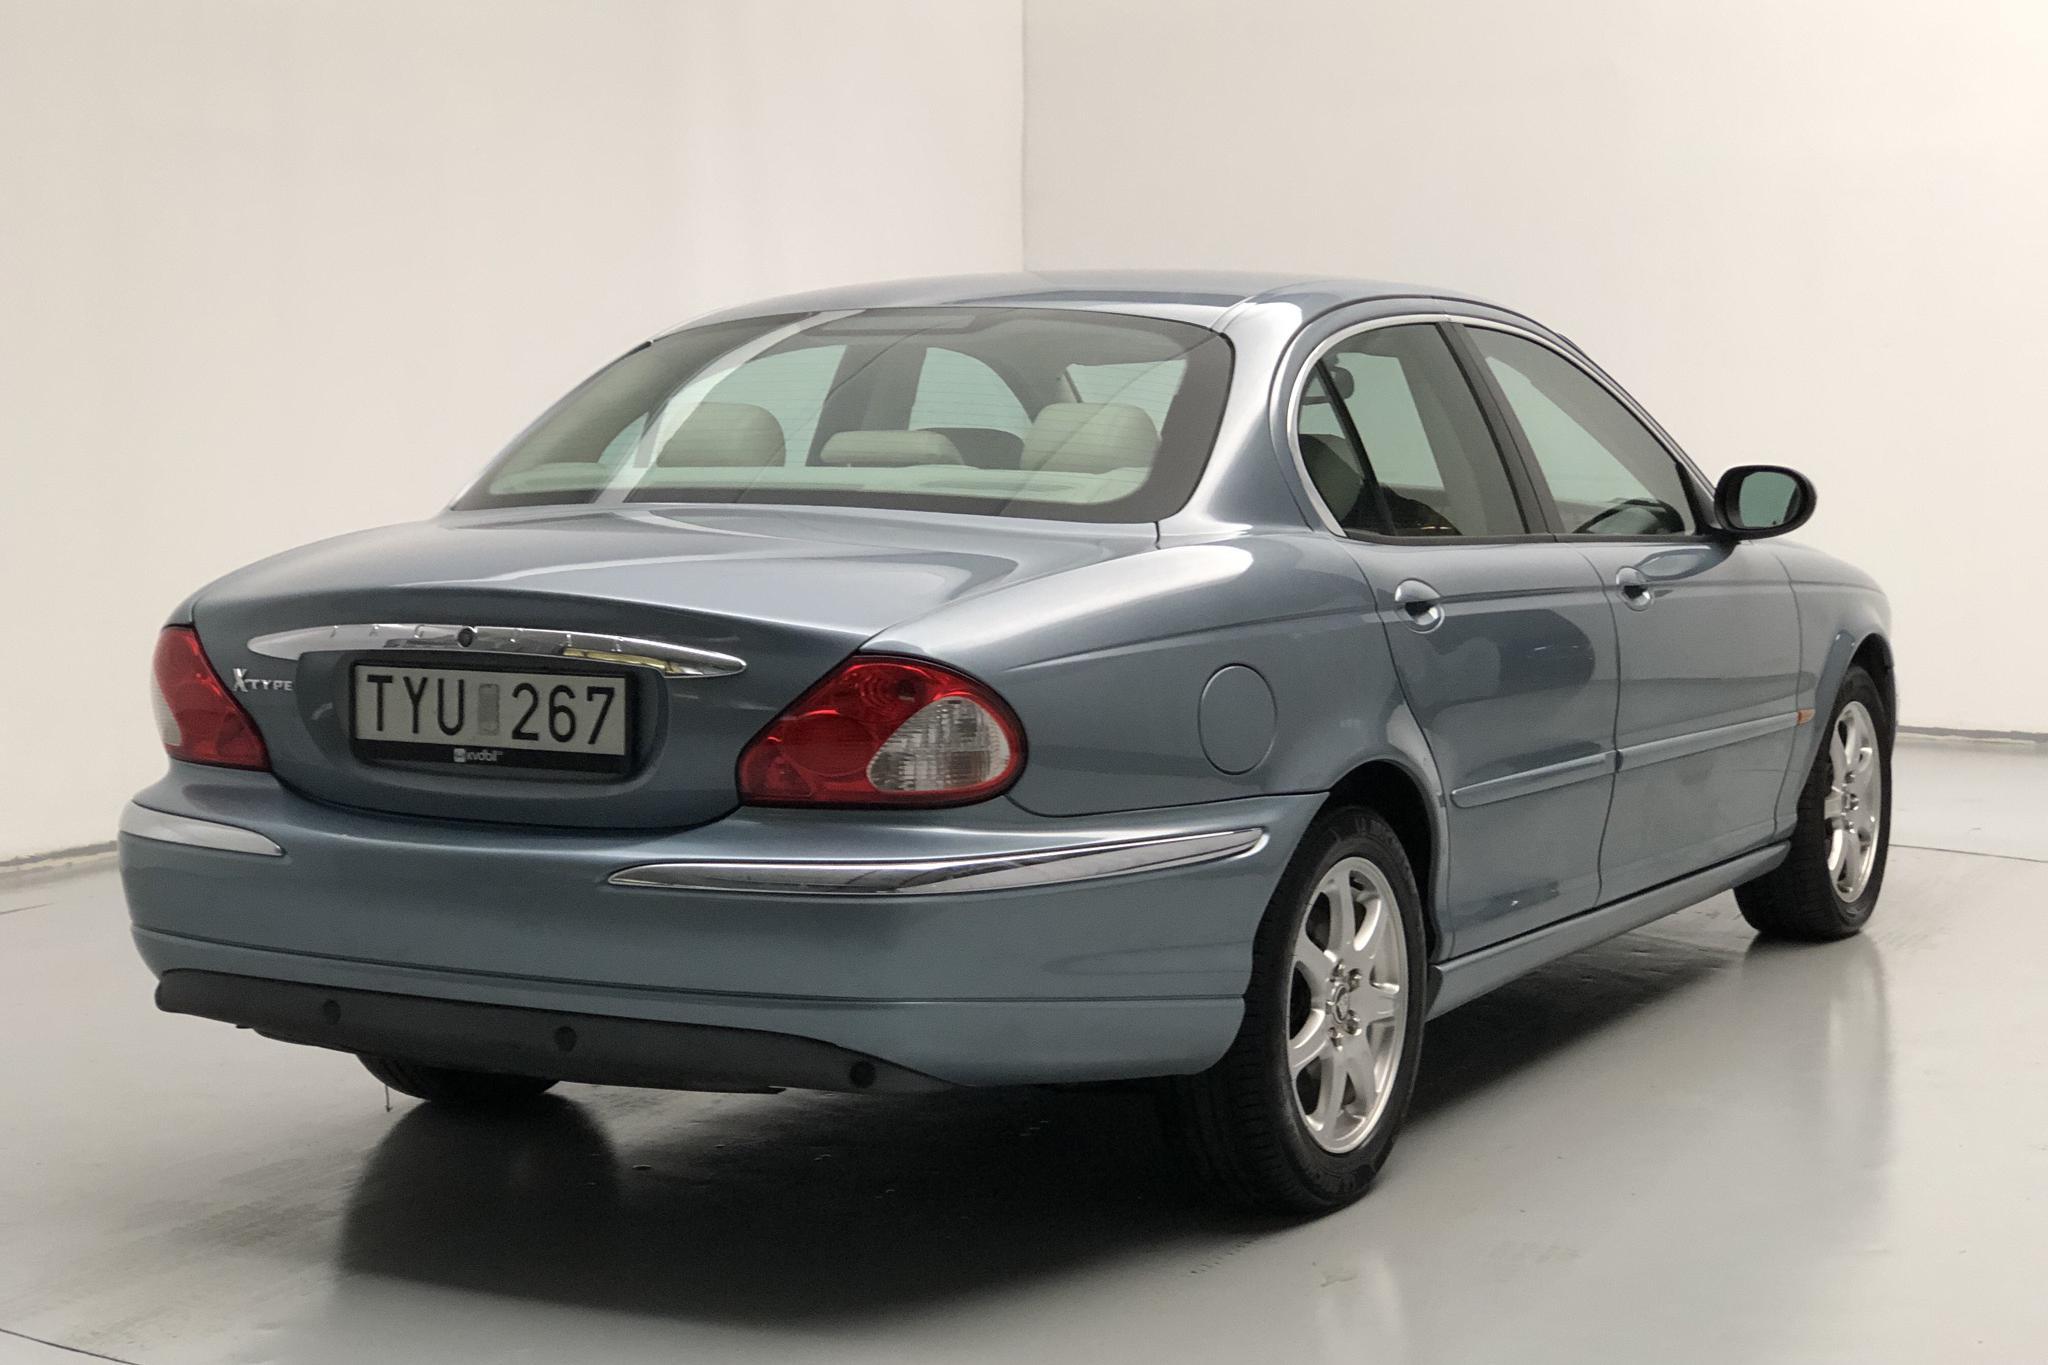 Jaguar X-type 2.0 V6 (155hk) - 17 542 mil - Manuell - blå - 2003